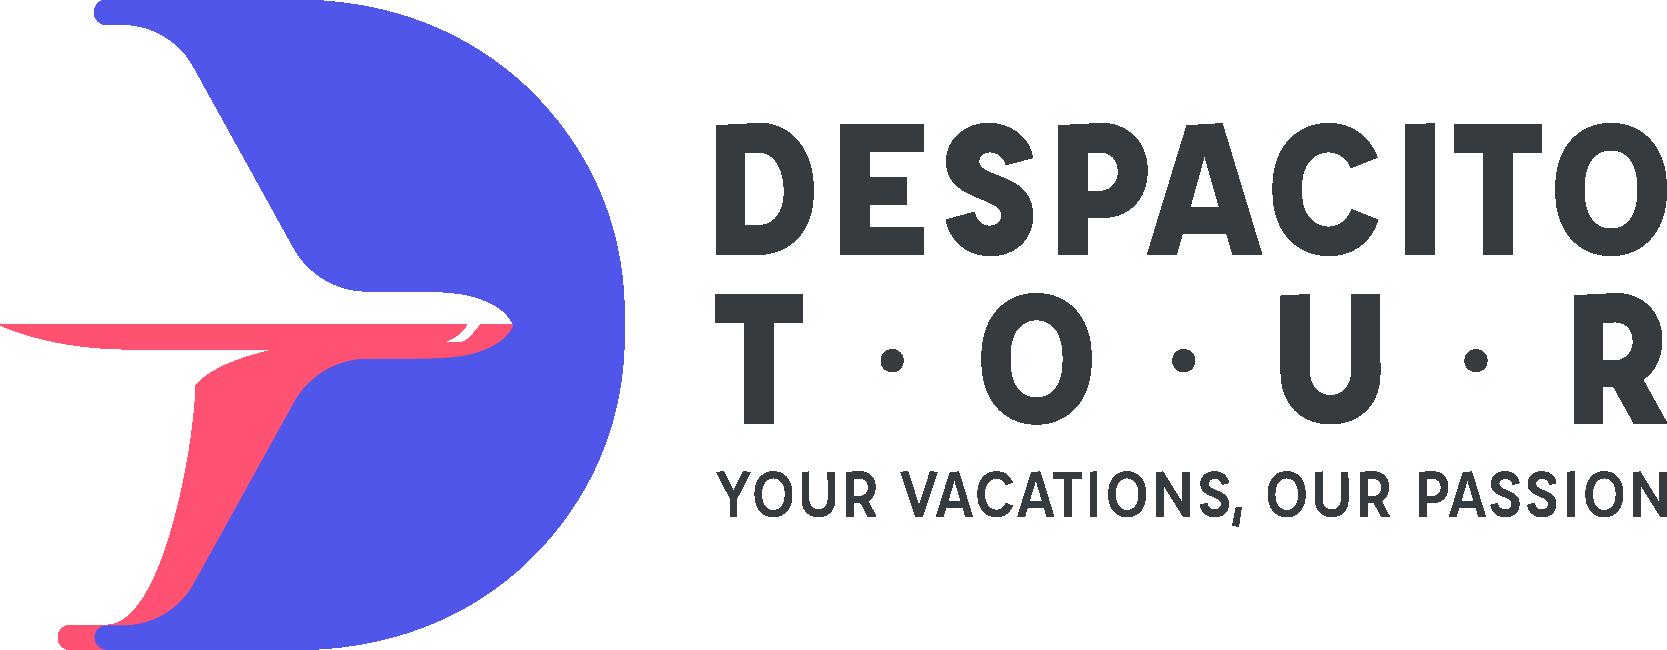 Despacito Tour